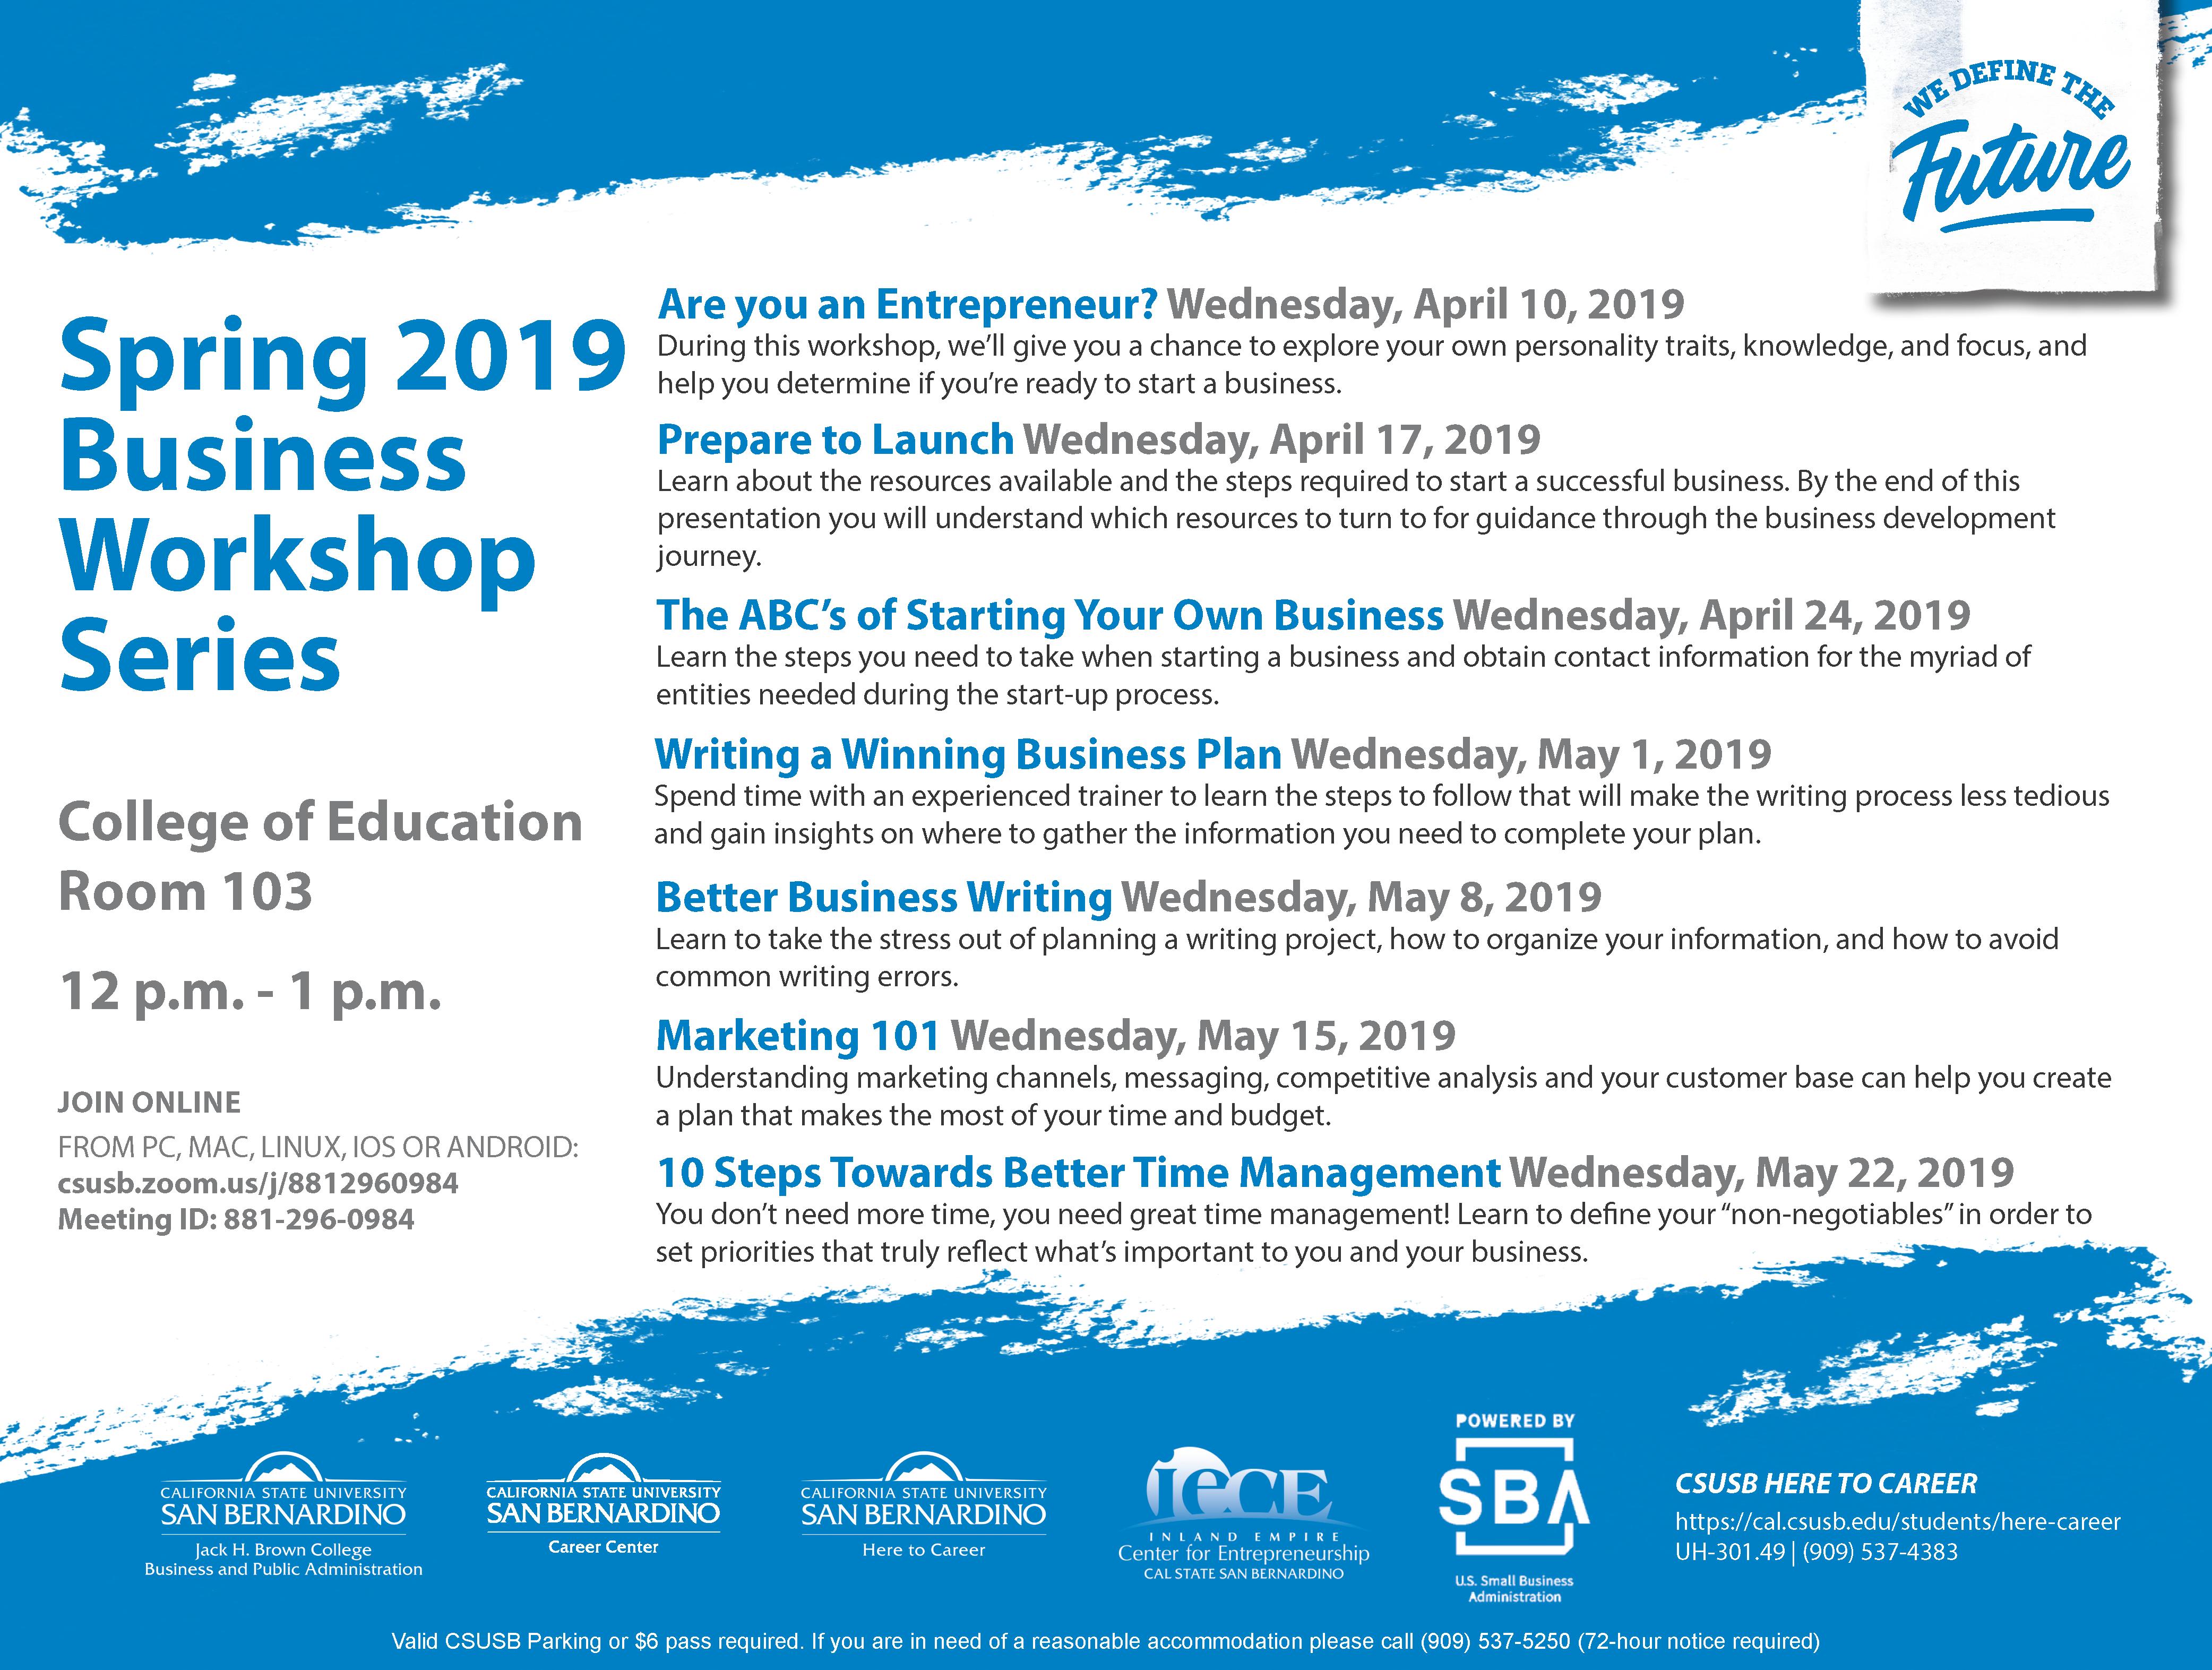 2018-2019 Business Workshop Series